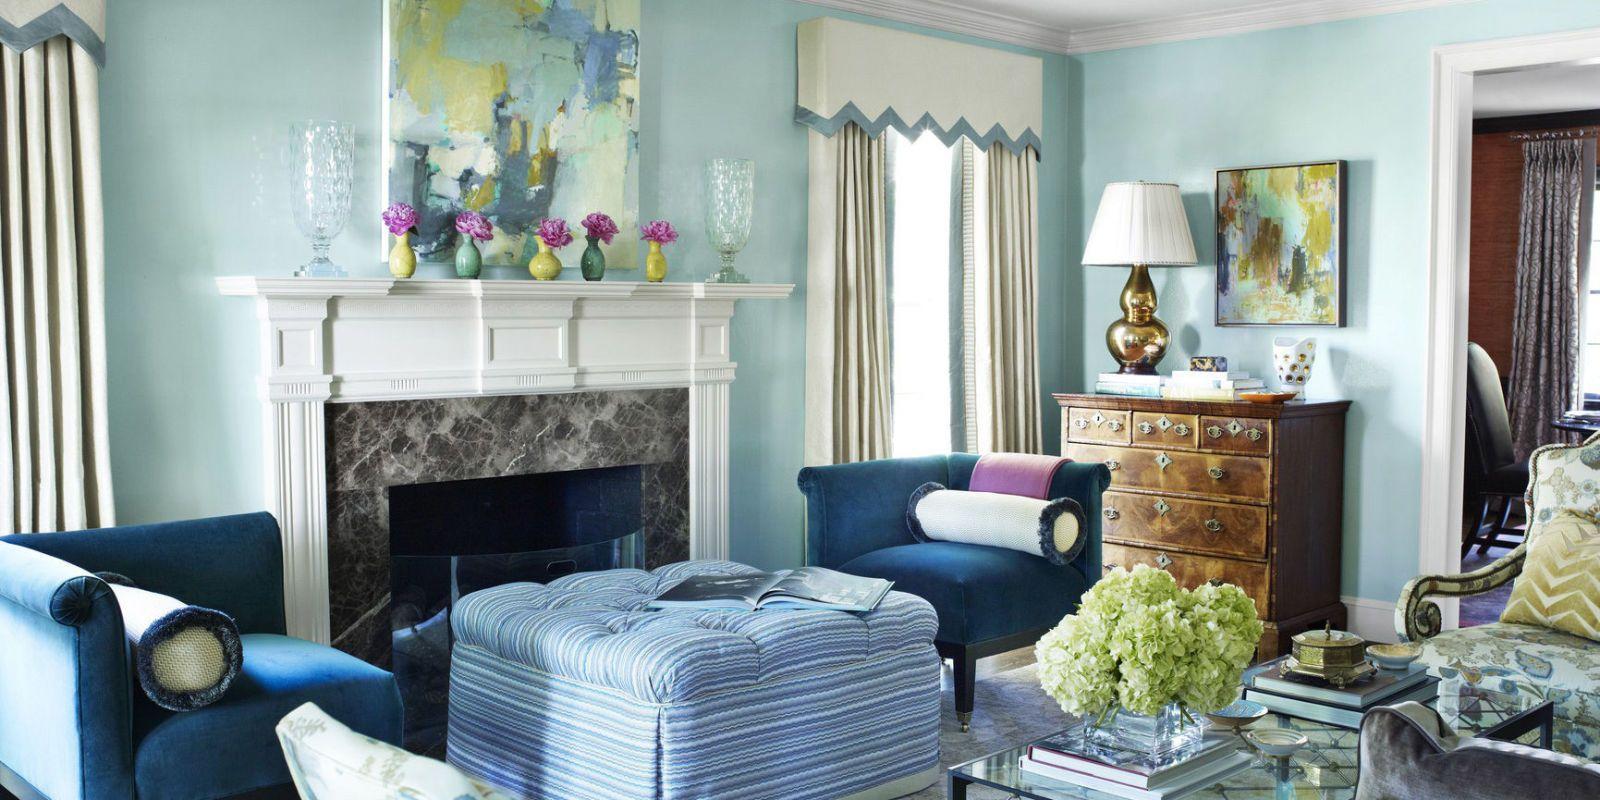 15 best living room color ideas top paint colors for living rooms rh housebeautiful com painting living room ideas modern painting living room ideas color scheme